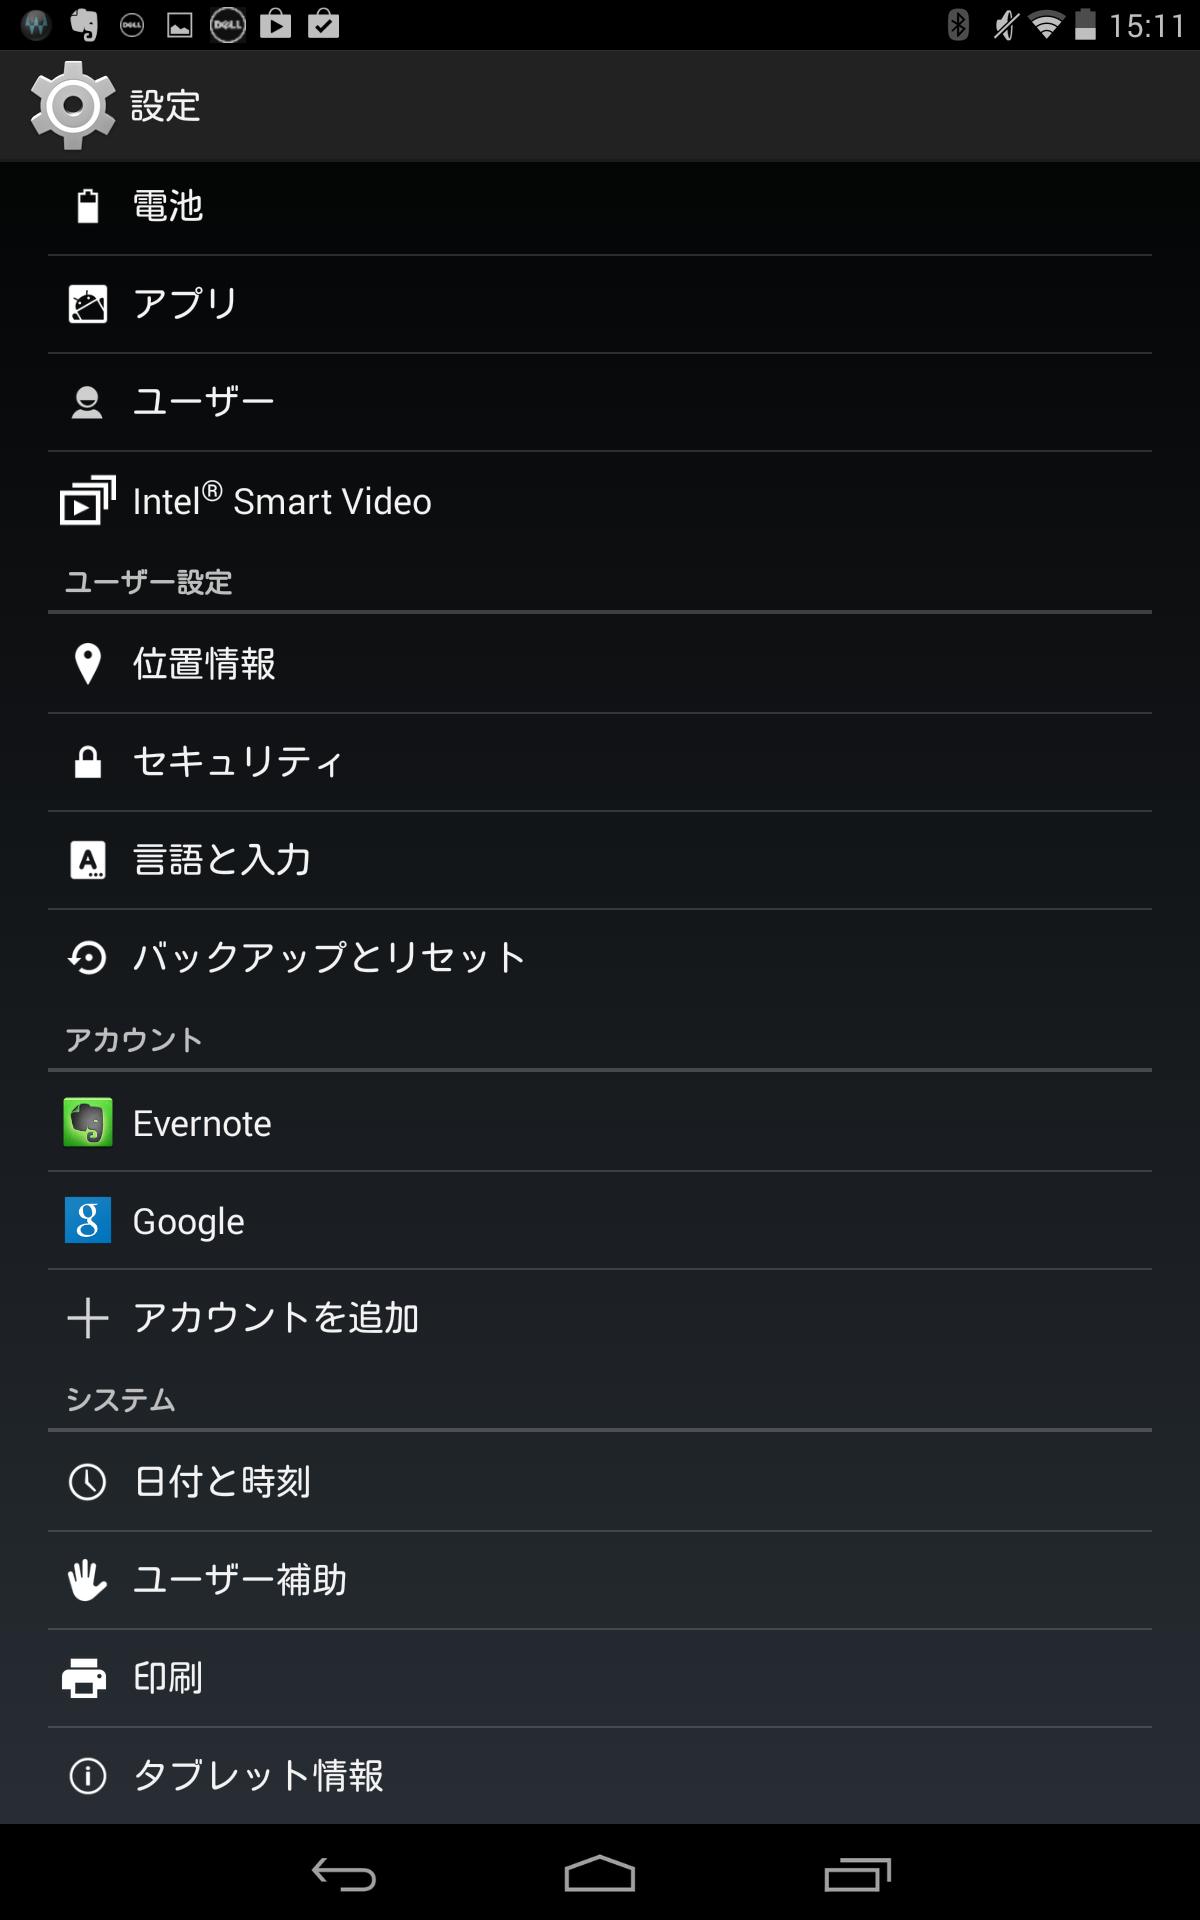 Screenshot_2014-09-28-15-11-25